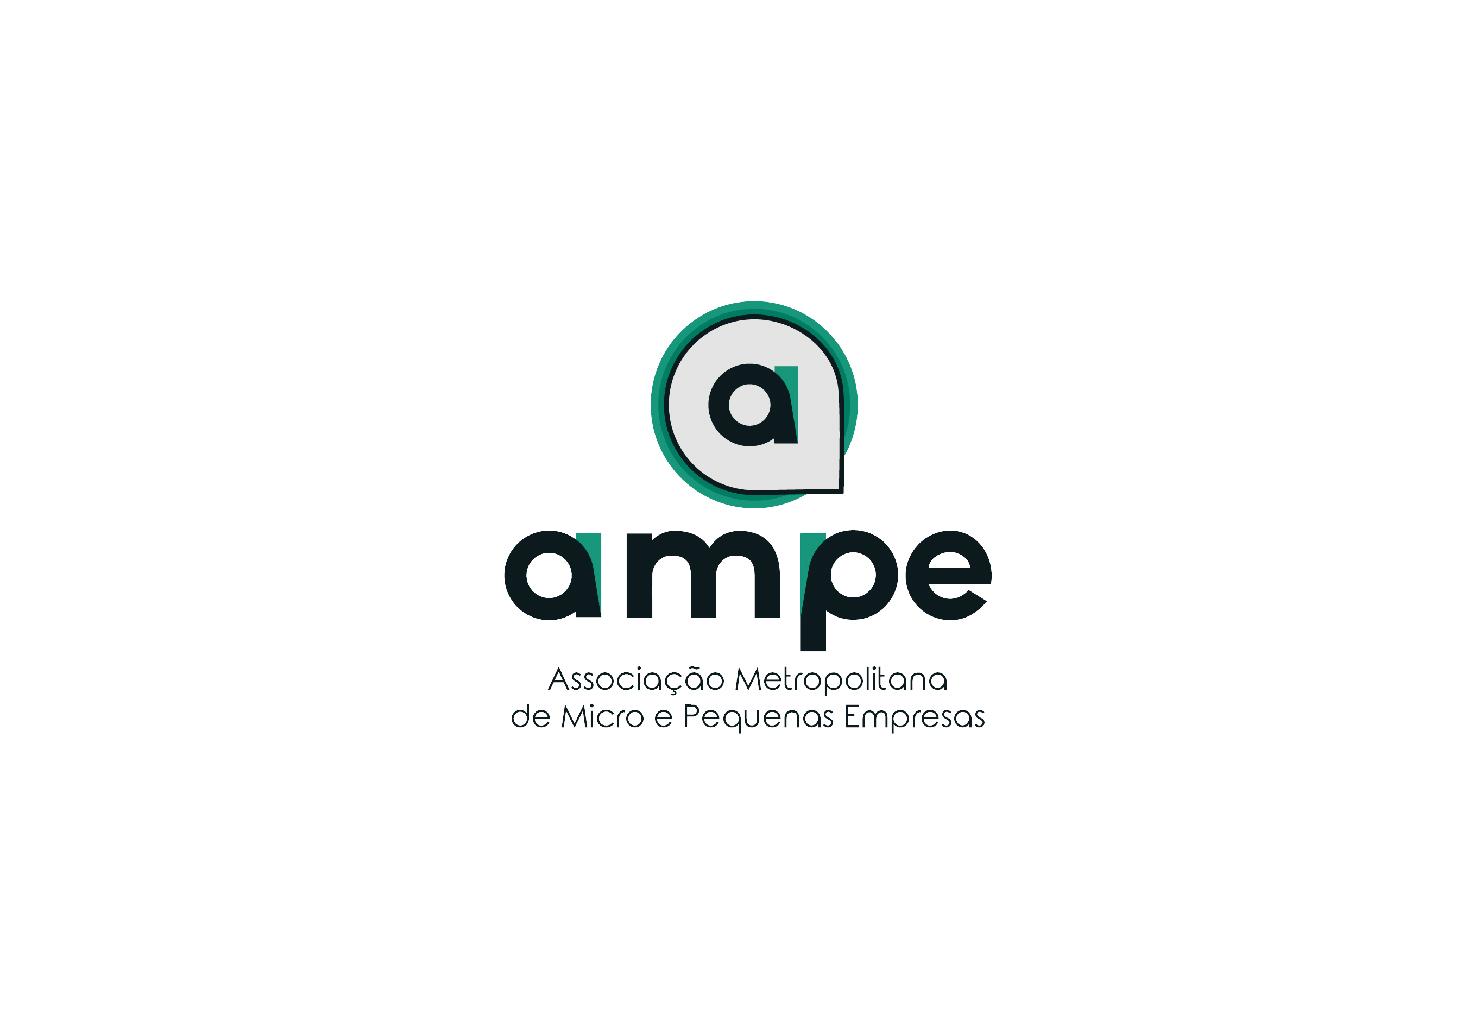 Logotipo AABOBB AMPE Metropolitana